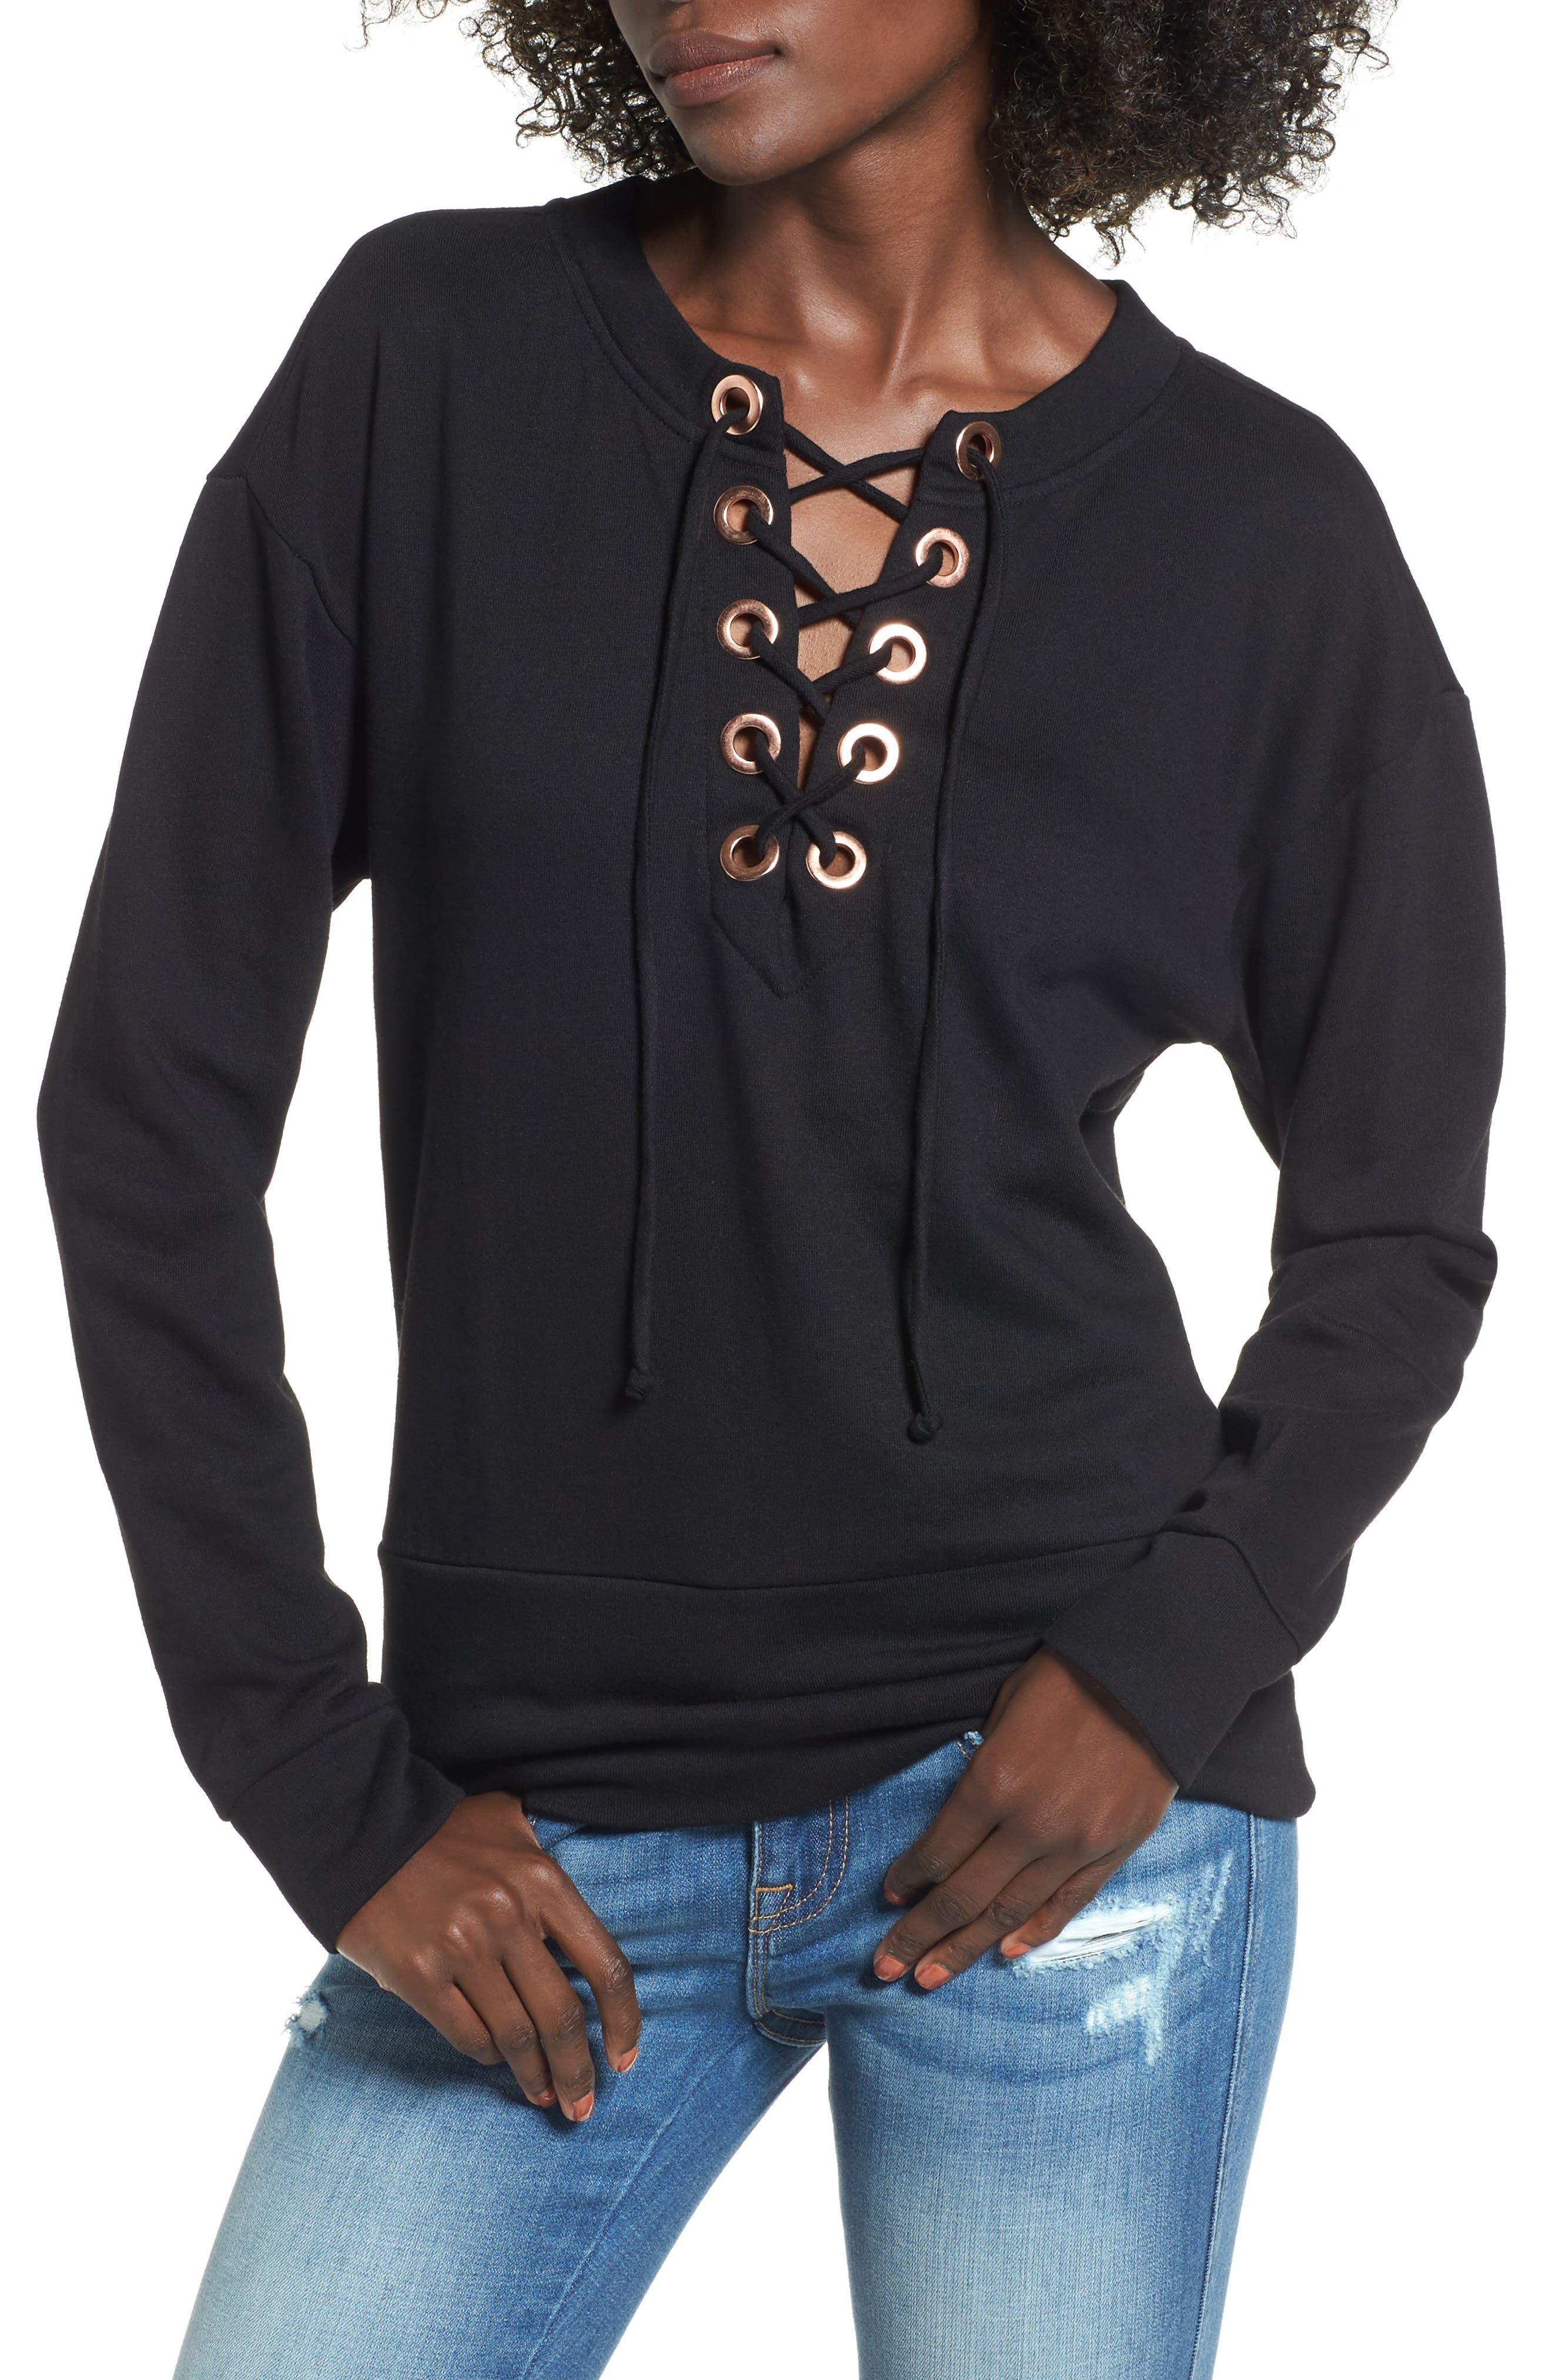 Alternate Image 1 Selected - Socialite Lace-Up Sweatshirt